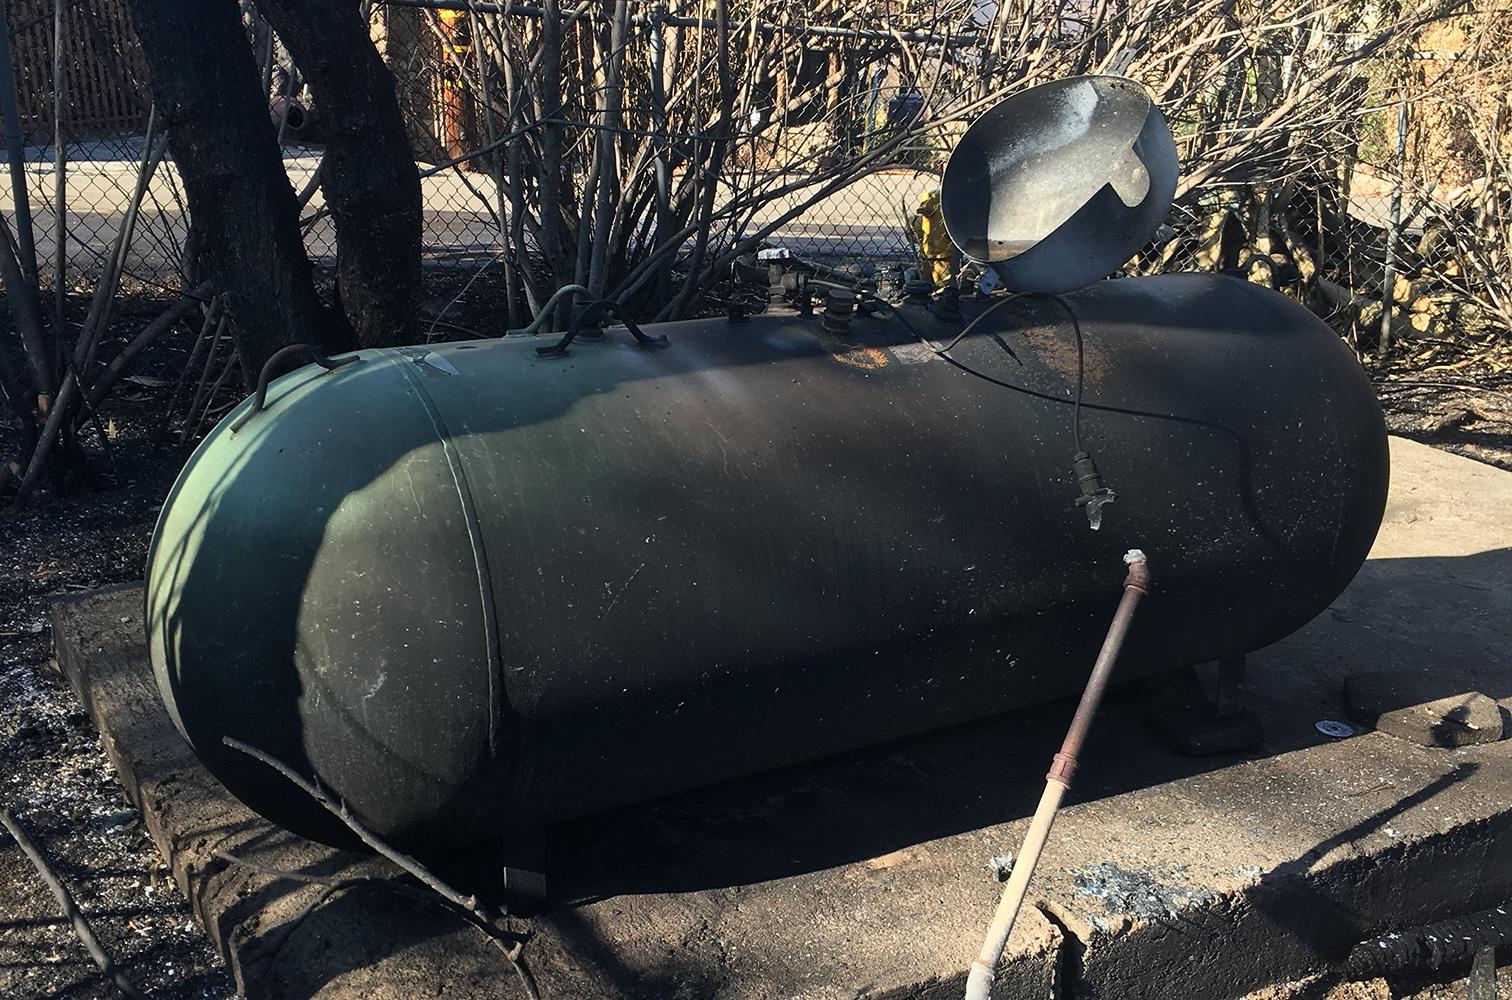 The Propane Tank